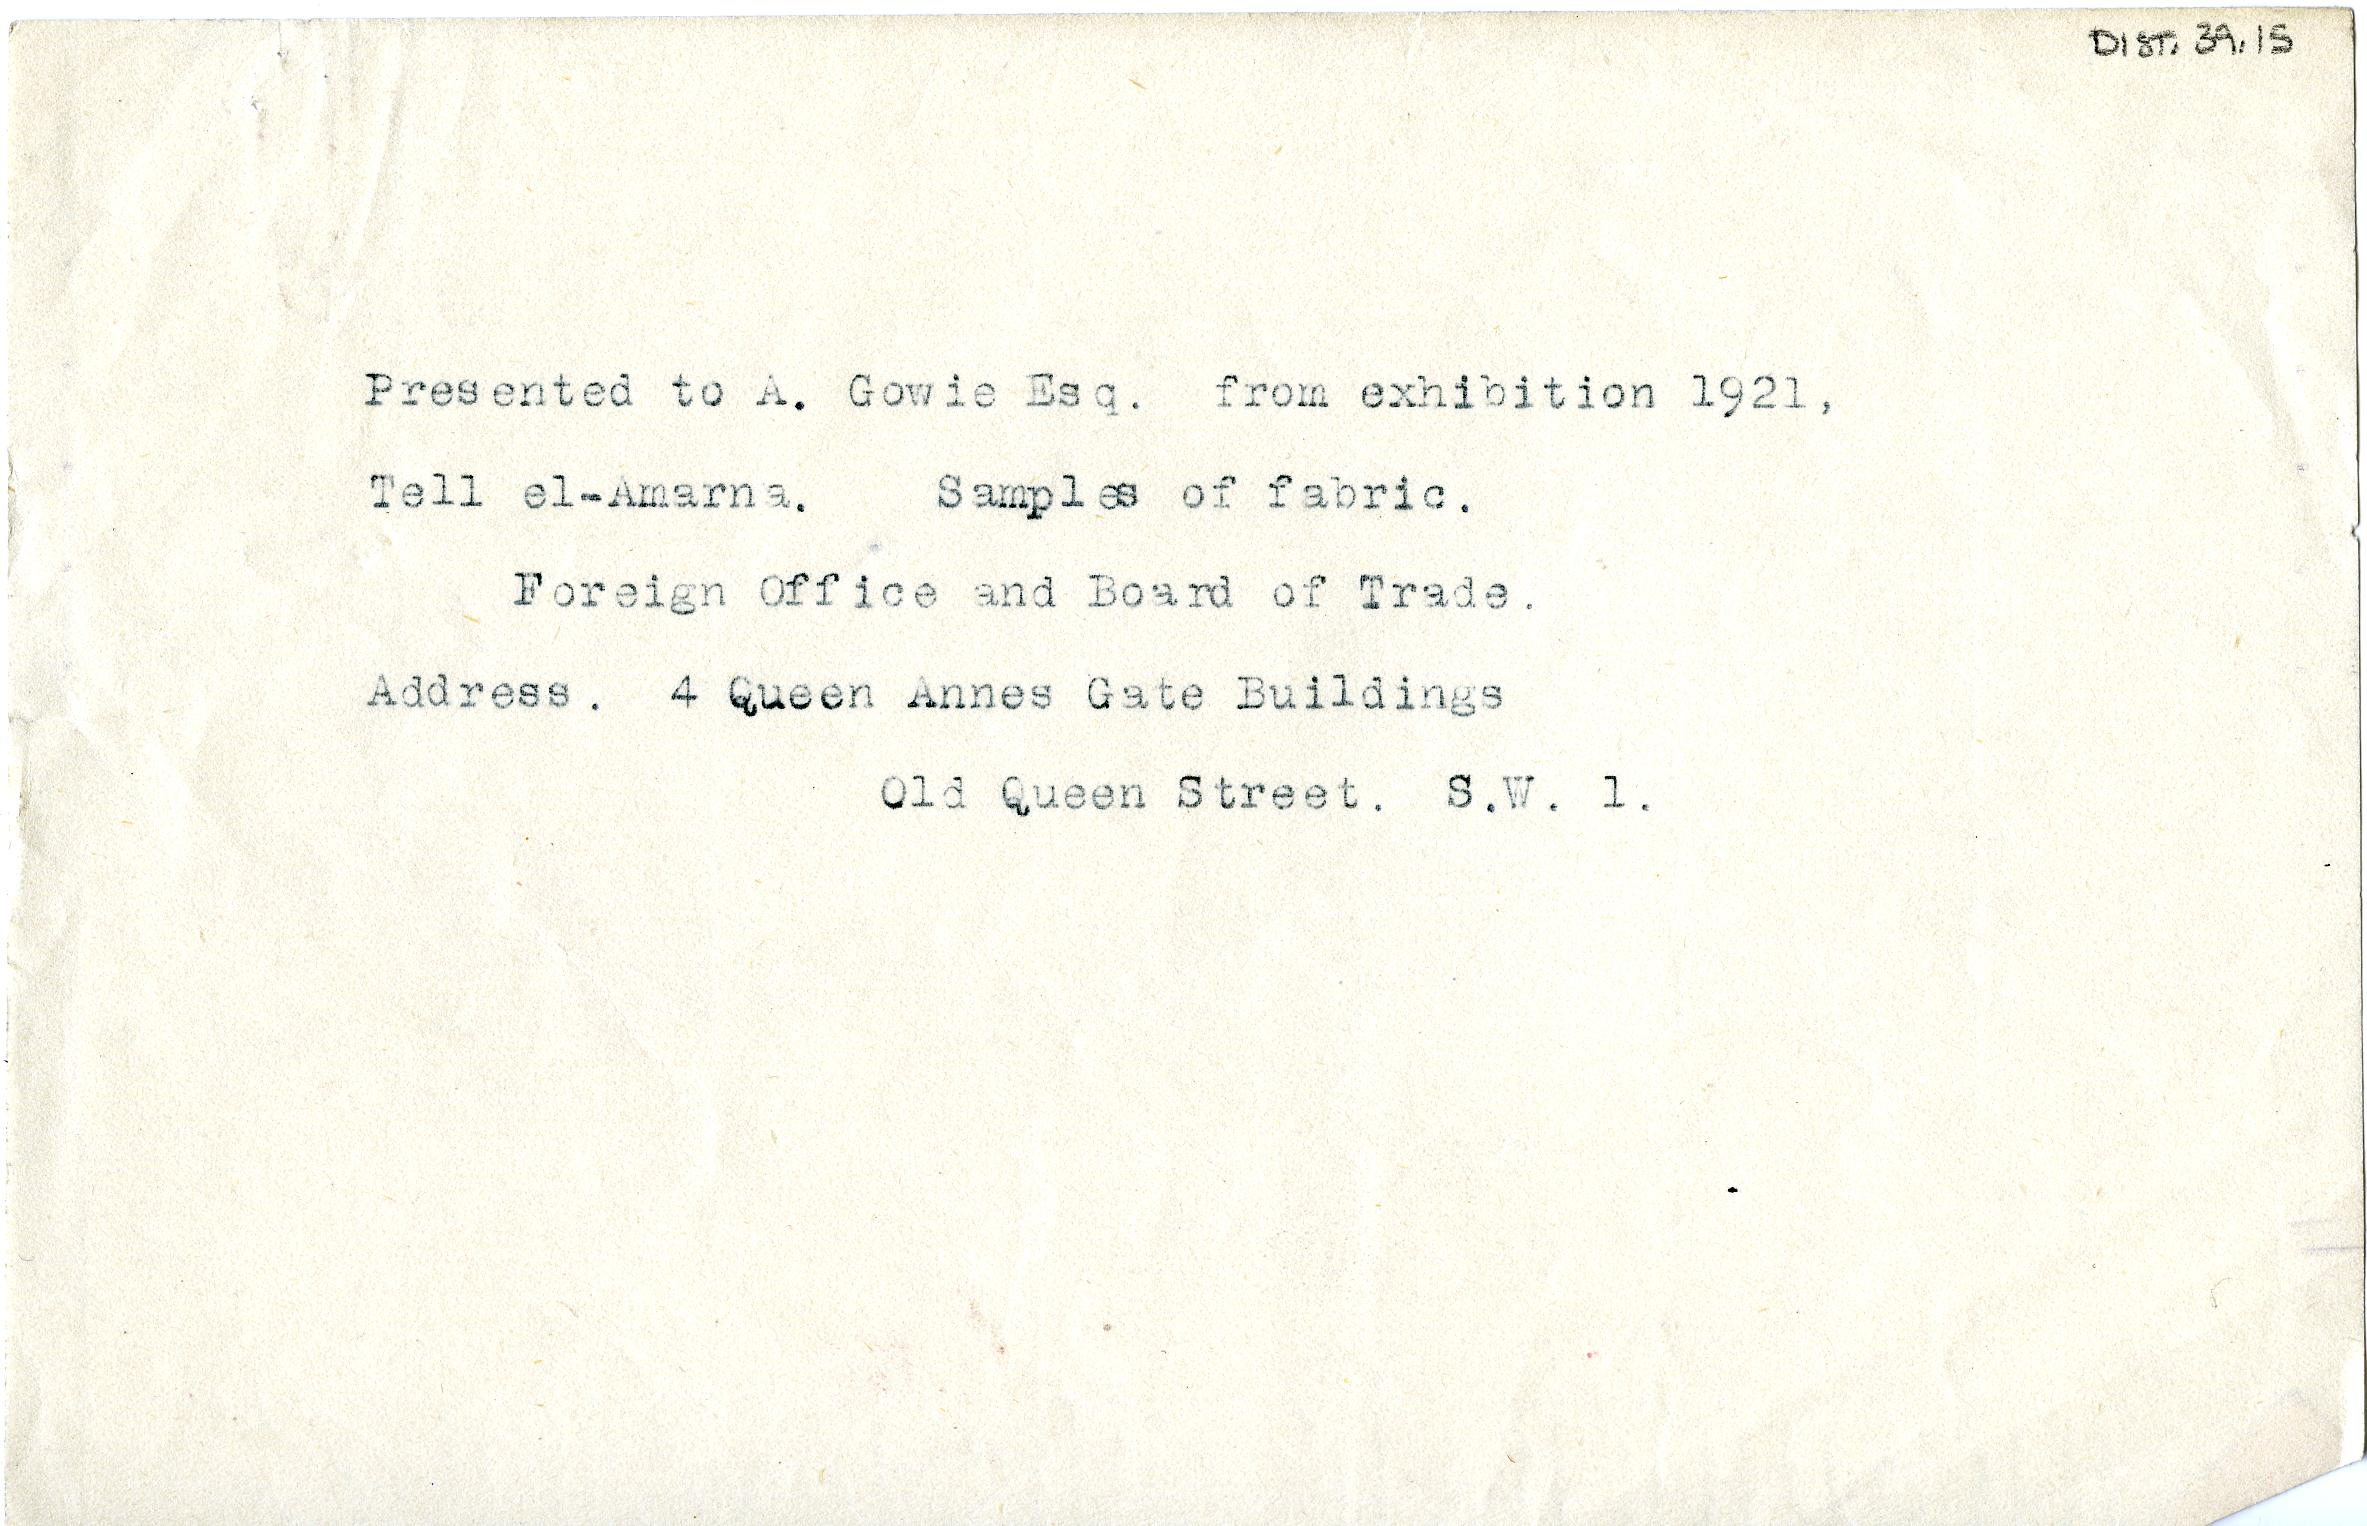 1921-22 Tell el-Amarna DIST.39.15